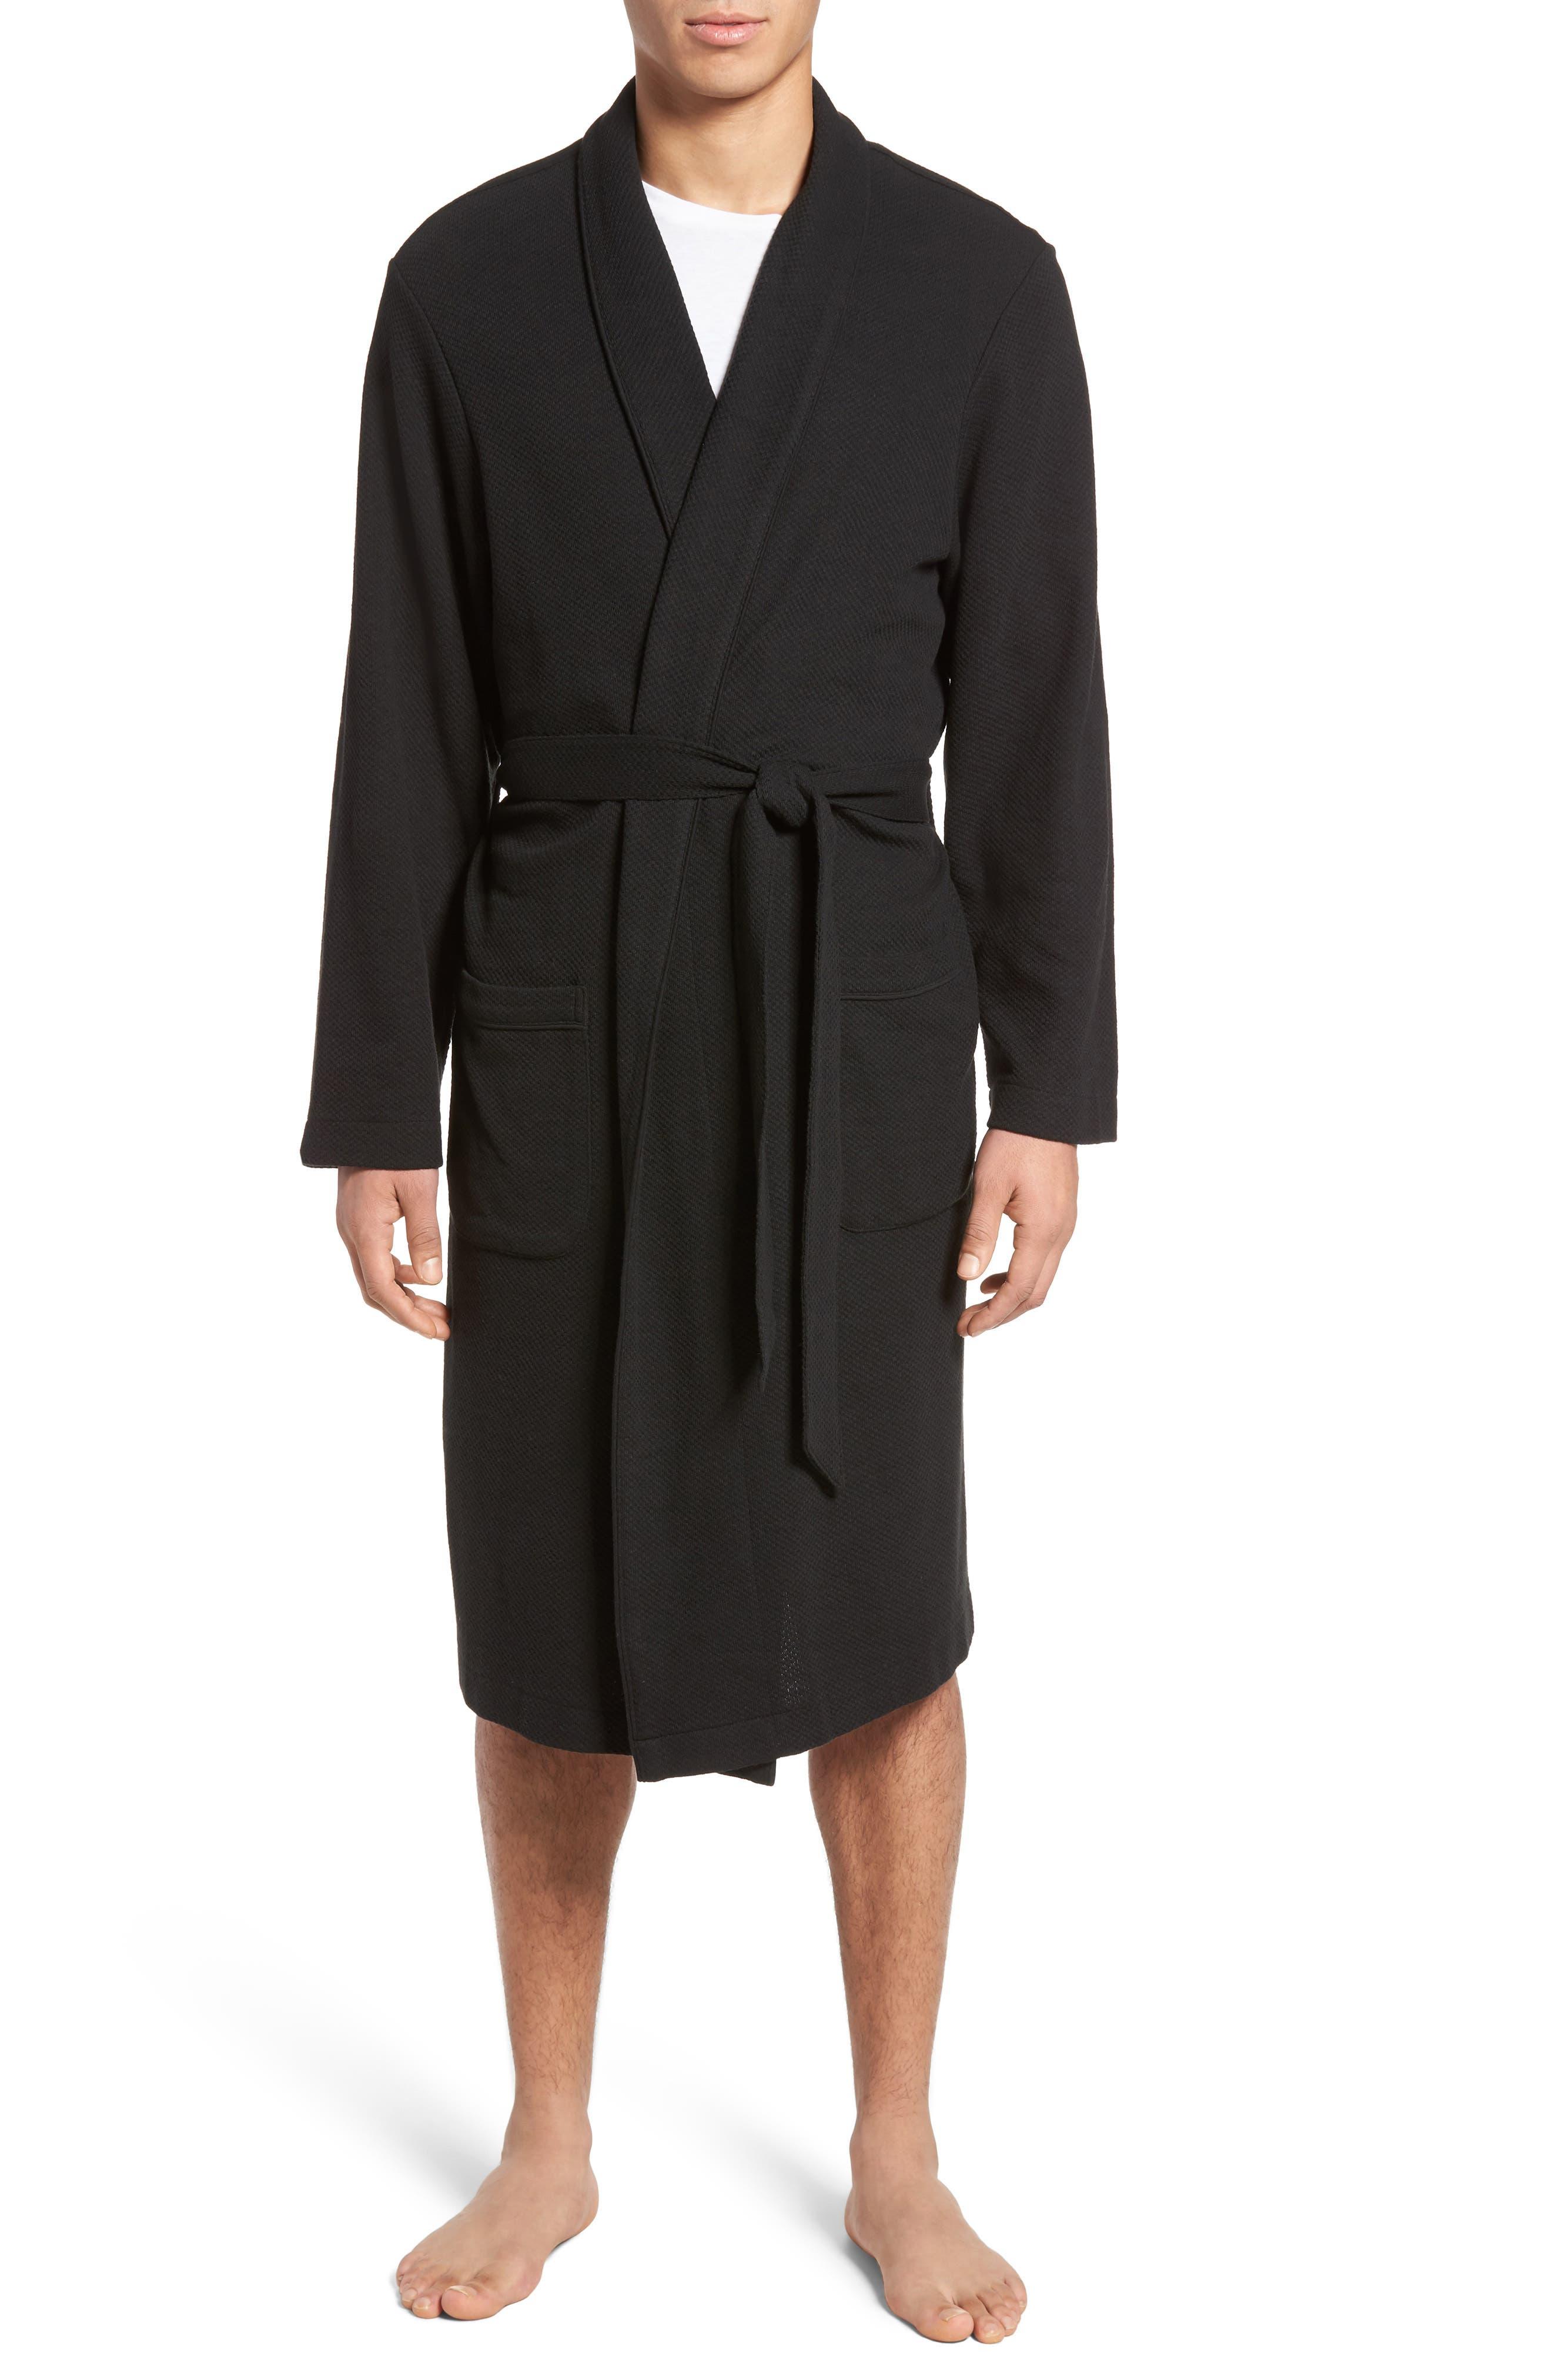 NORDSTROM MEN'S SHOP Thermal Robe, Main, color, 001